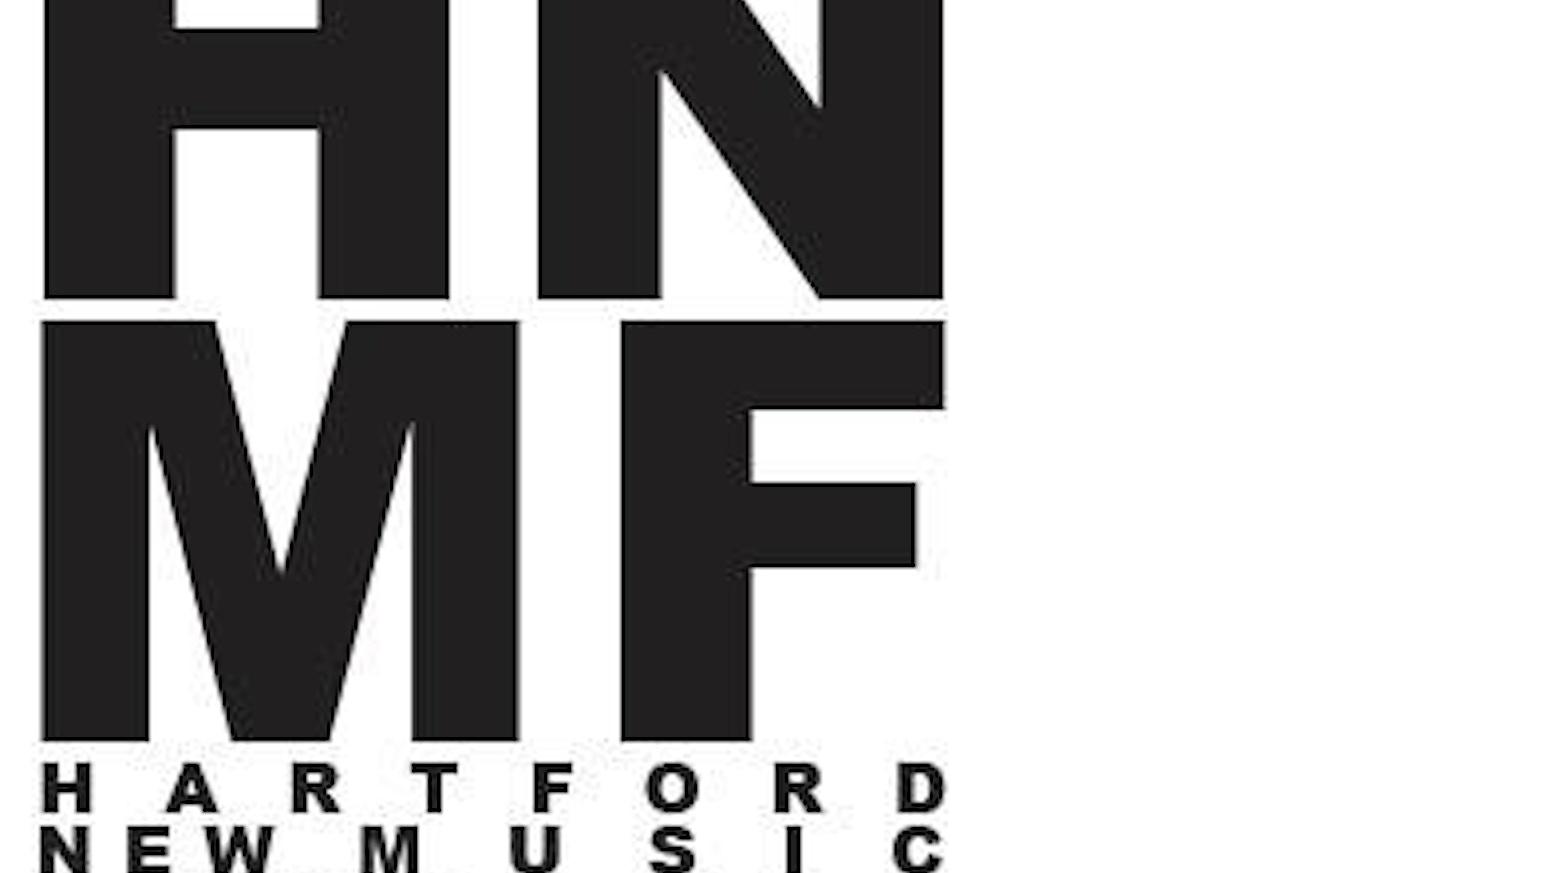 The Hartford At Work >> Hartford New Music Festival 2015 By Hartford New Music